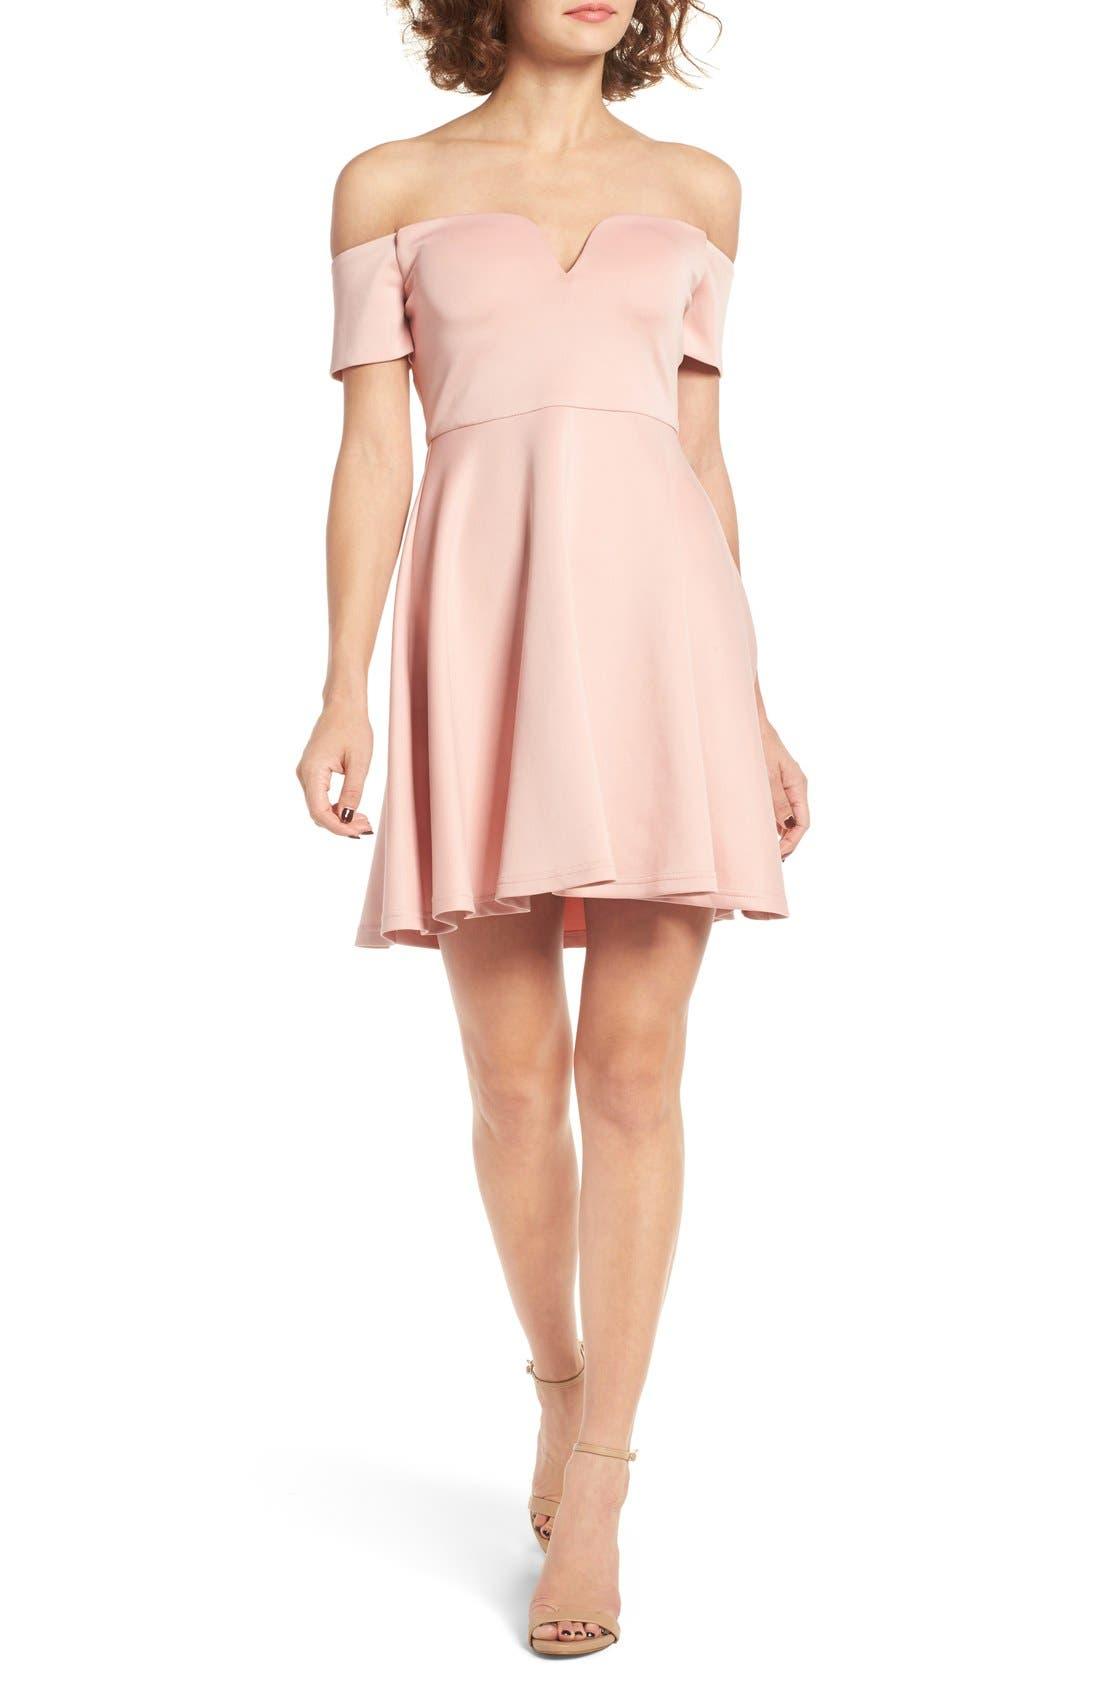 Main Image - Cream & Sugar Sweetheart Off the Shoulder Dress